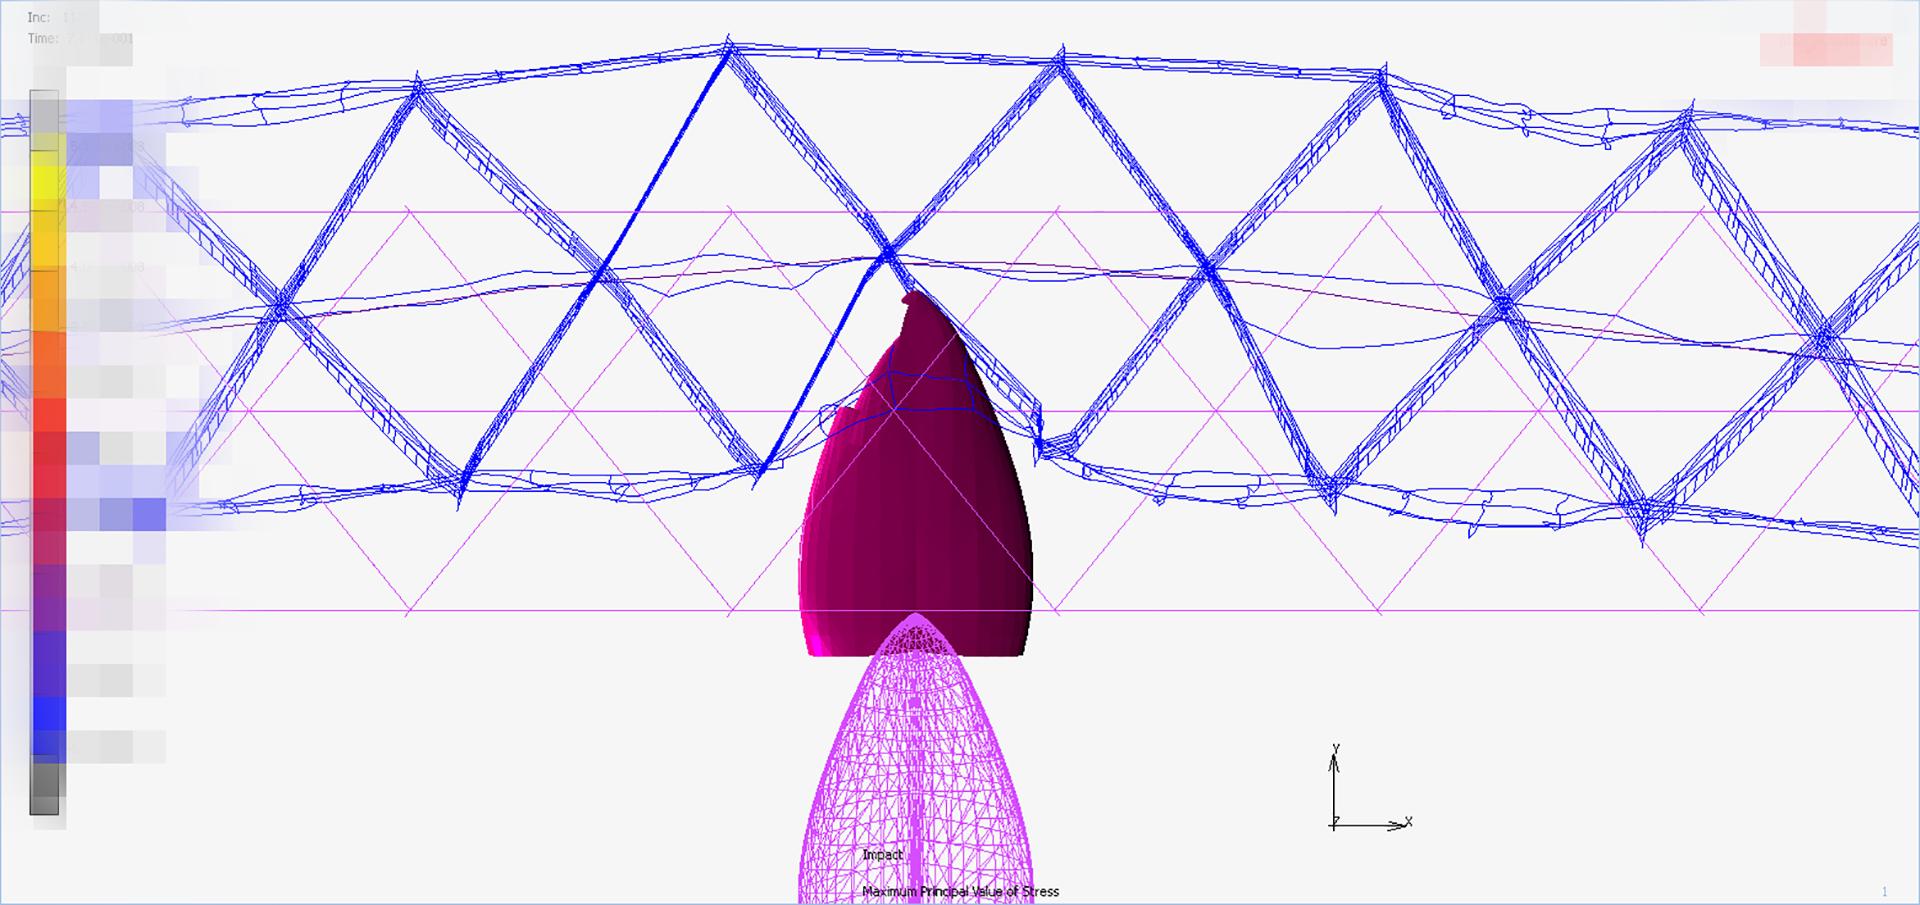 Impact performance simulation of HALO GUARDIAN using advanced finite element analysis software.